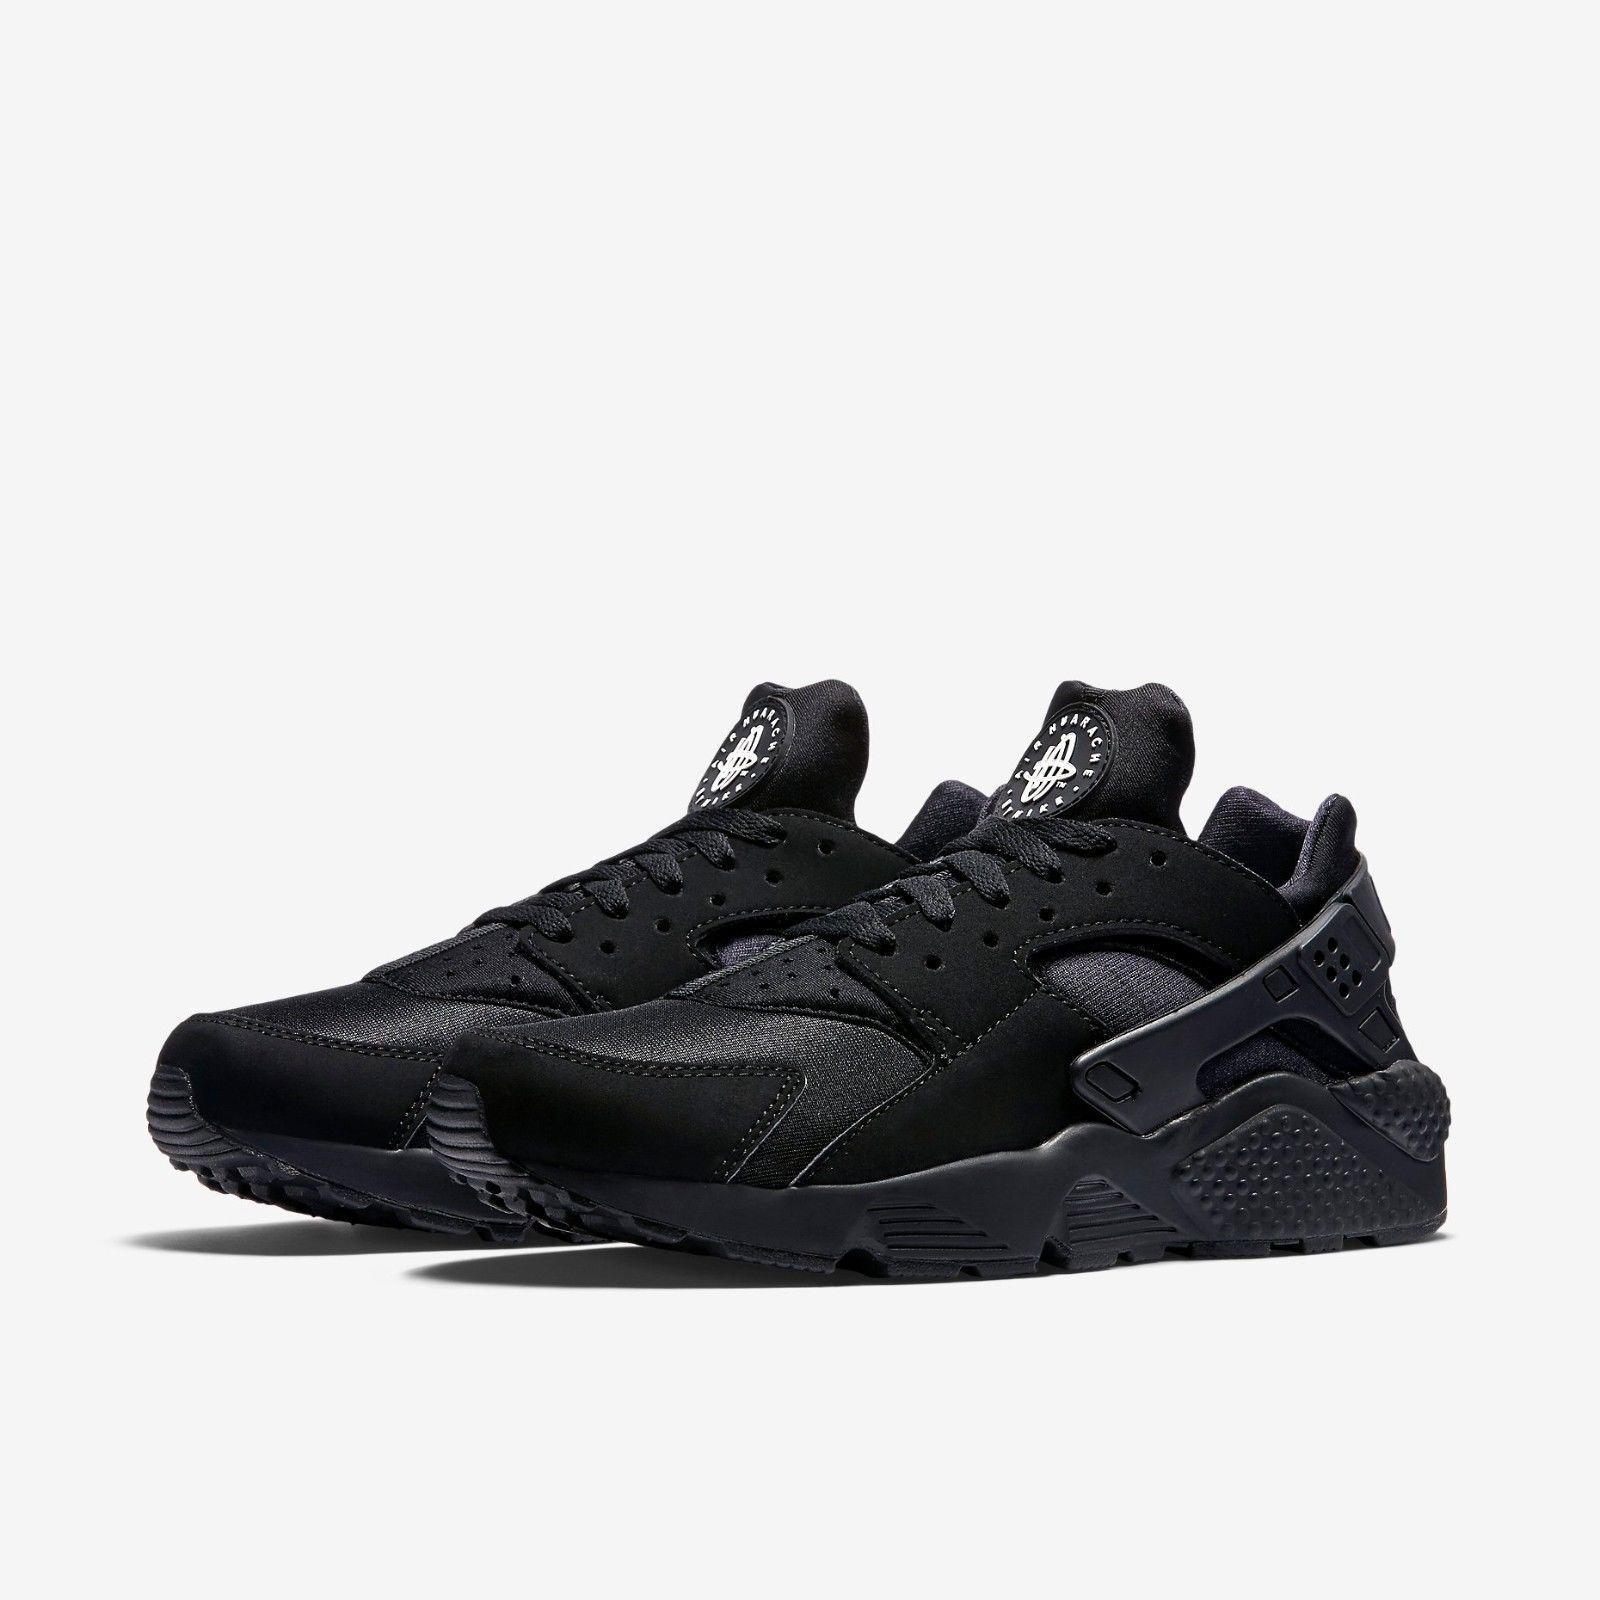 Nike Air Huarache Triple Black Mens US Sizes 11.5 [318429-003]